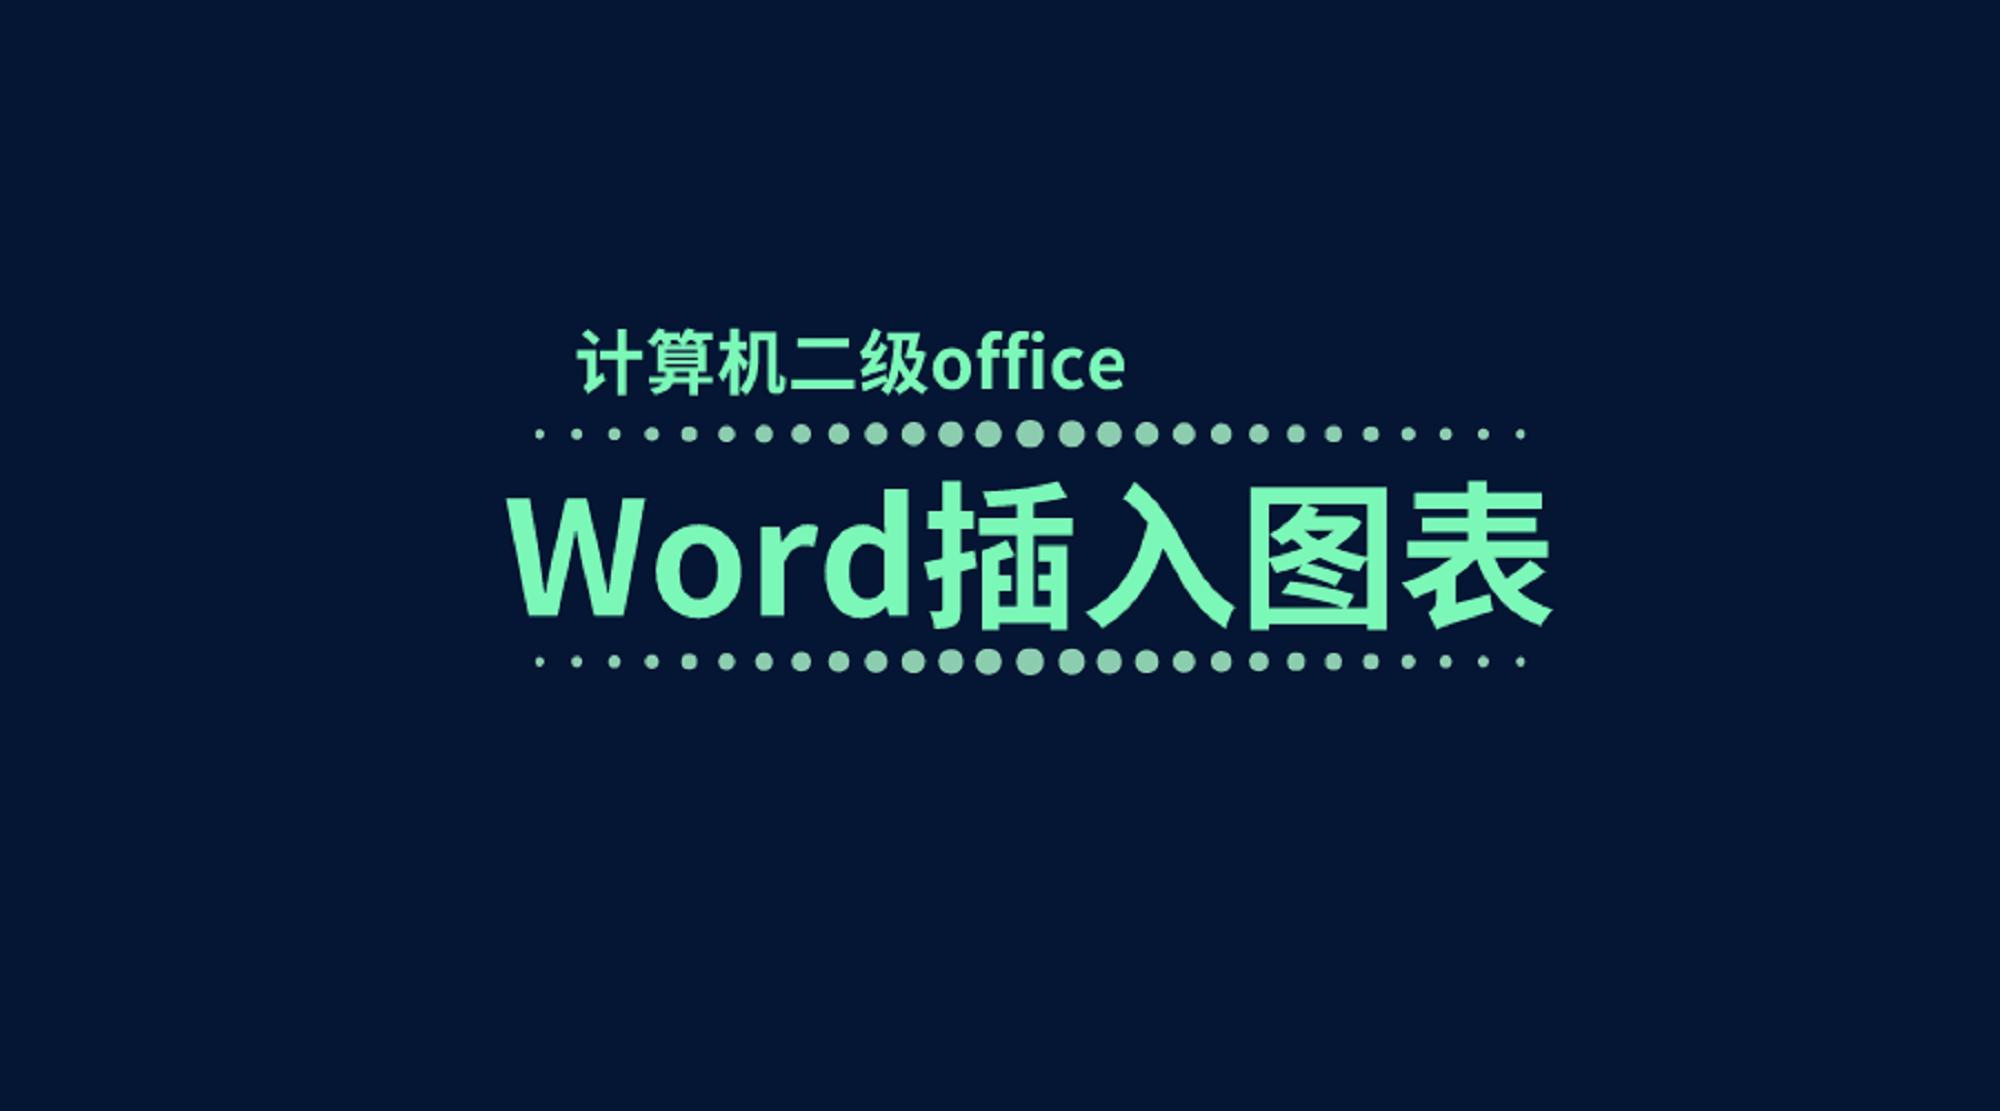 【word插入图表】计算机二级office2016版